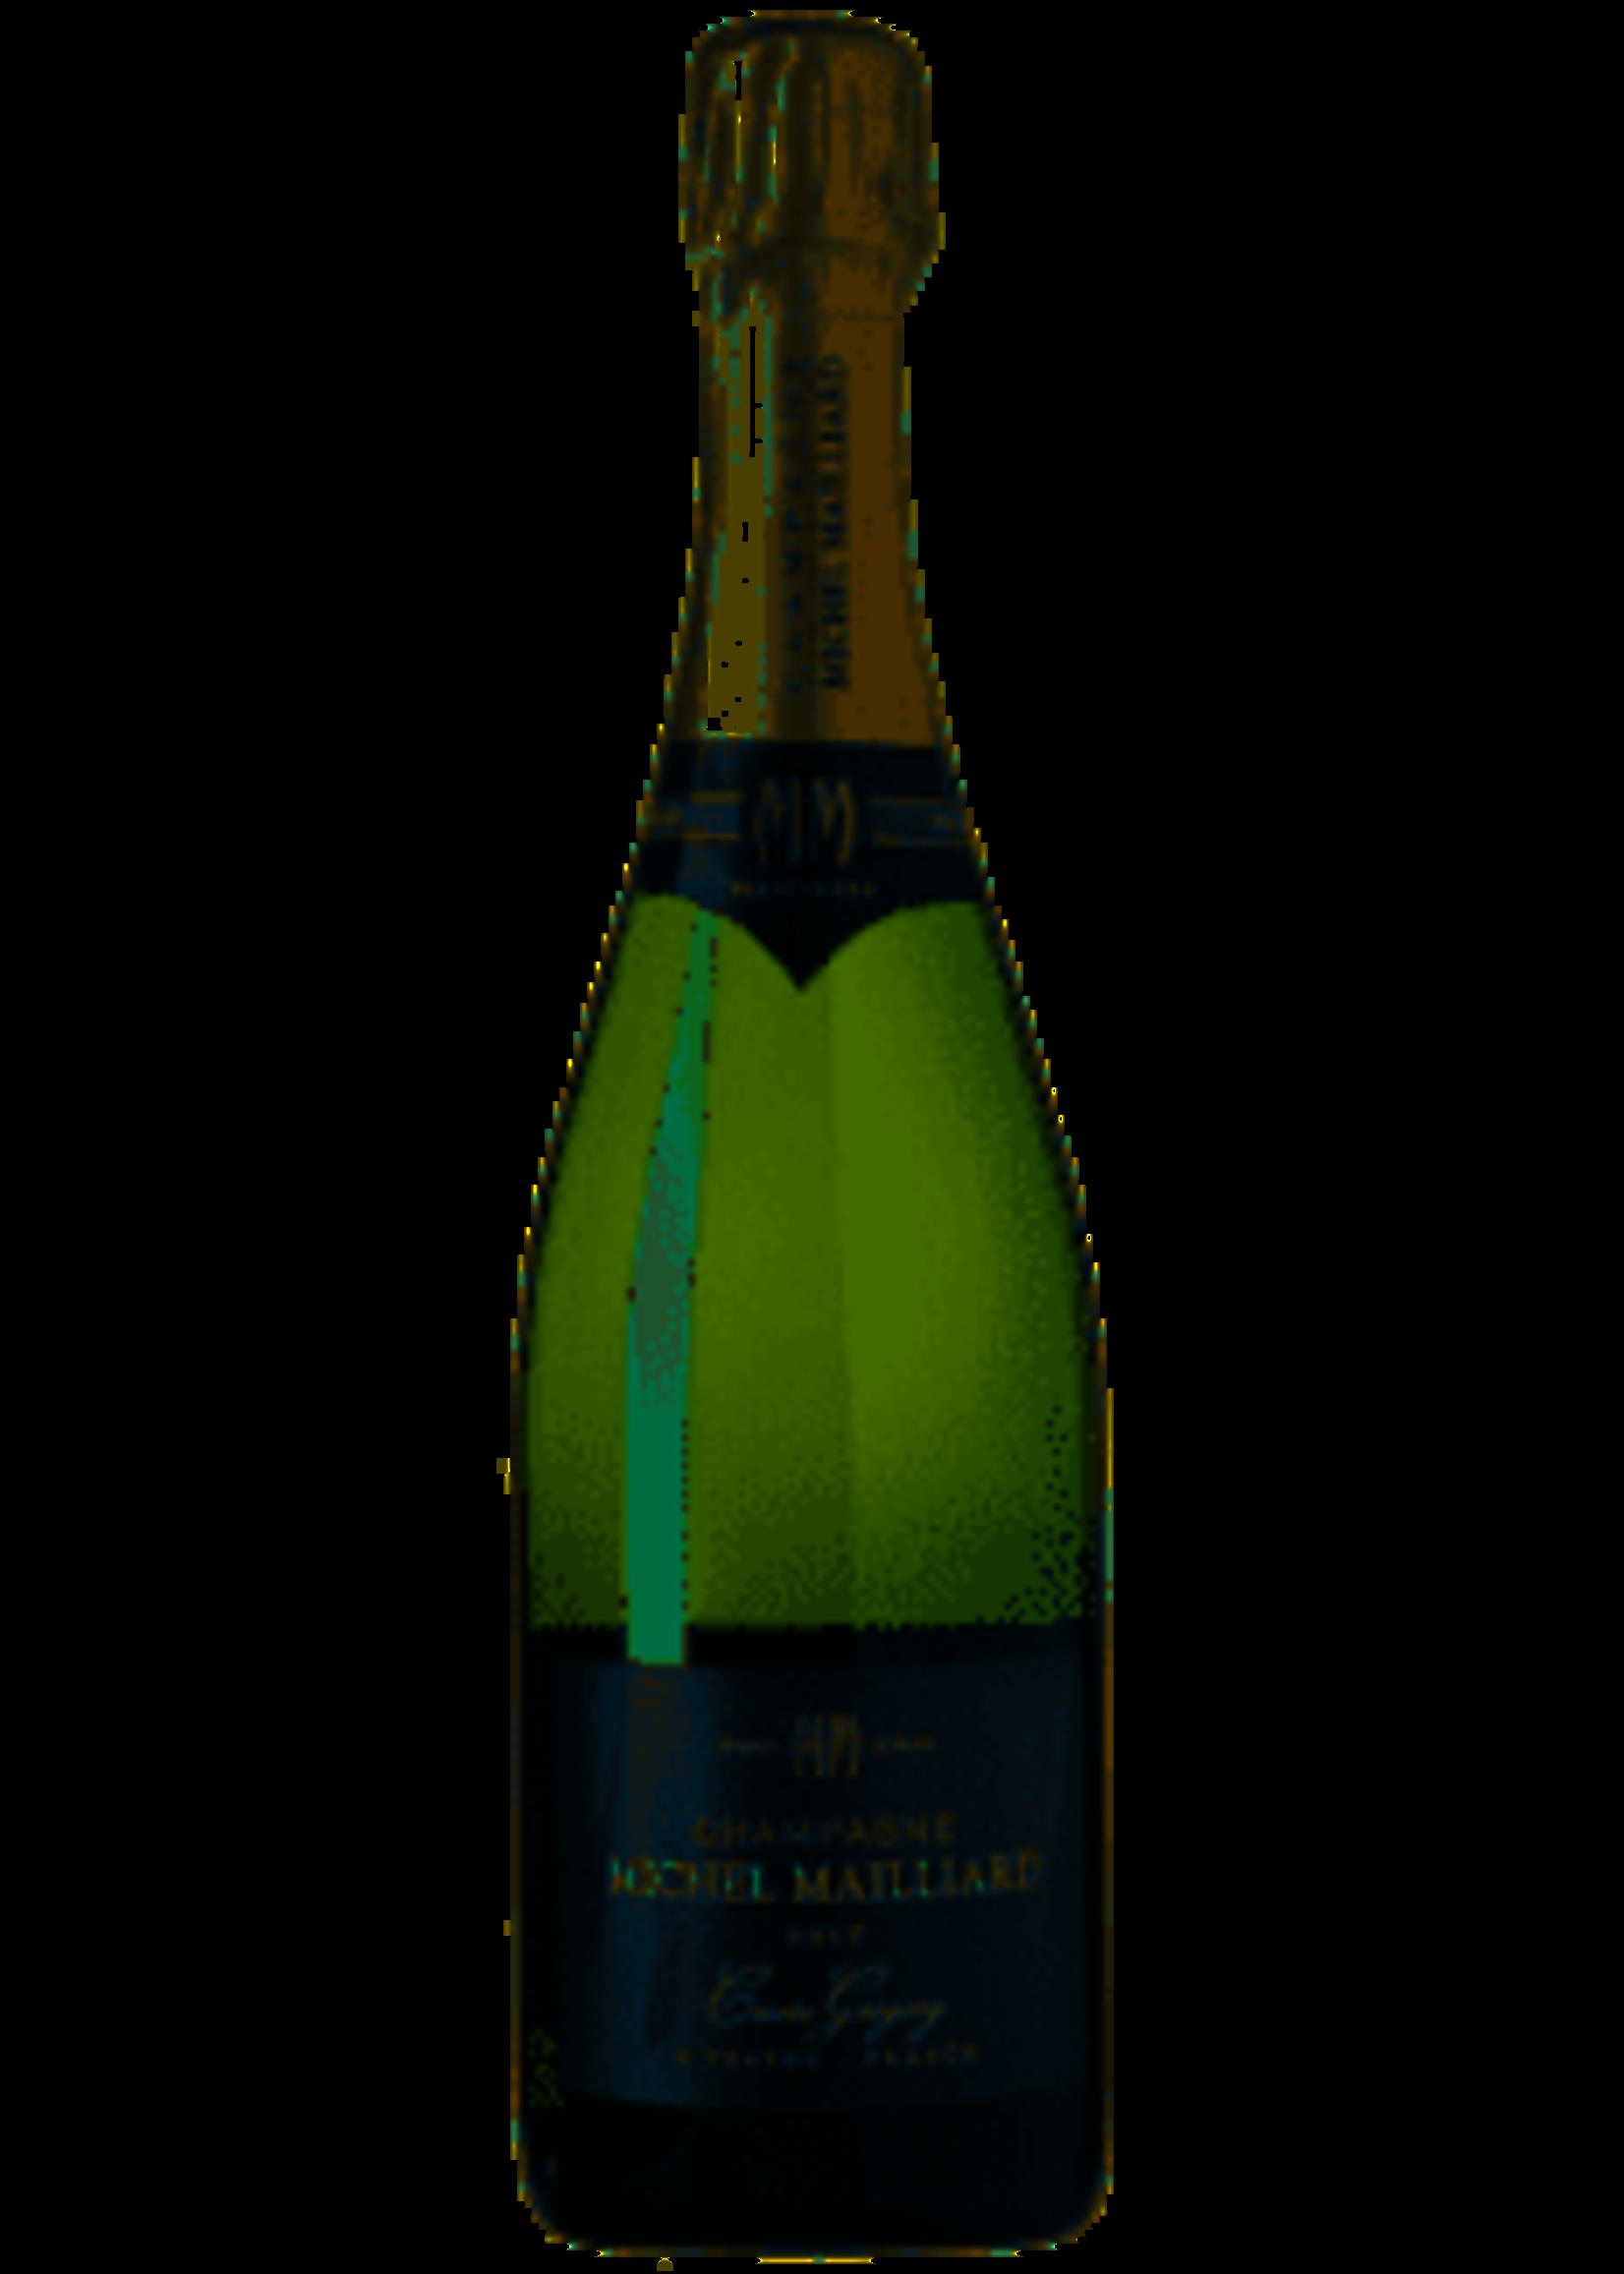 Michel Mailliard Champagne NV Cuvee Gregory Brut 1.5L